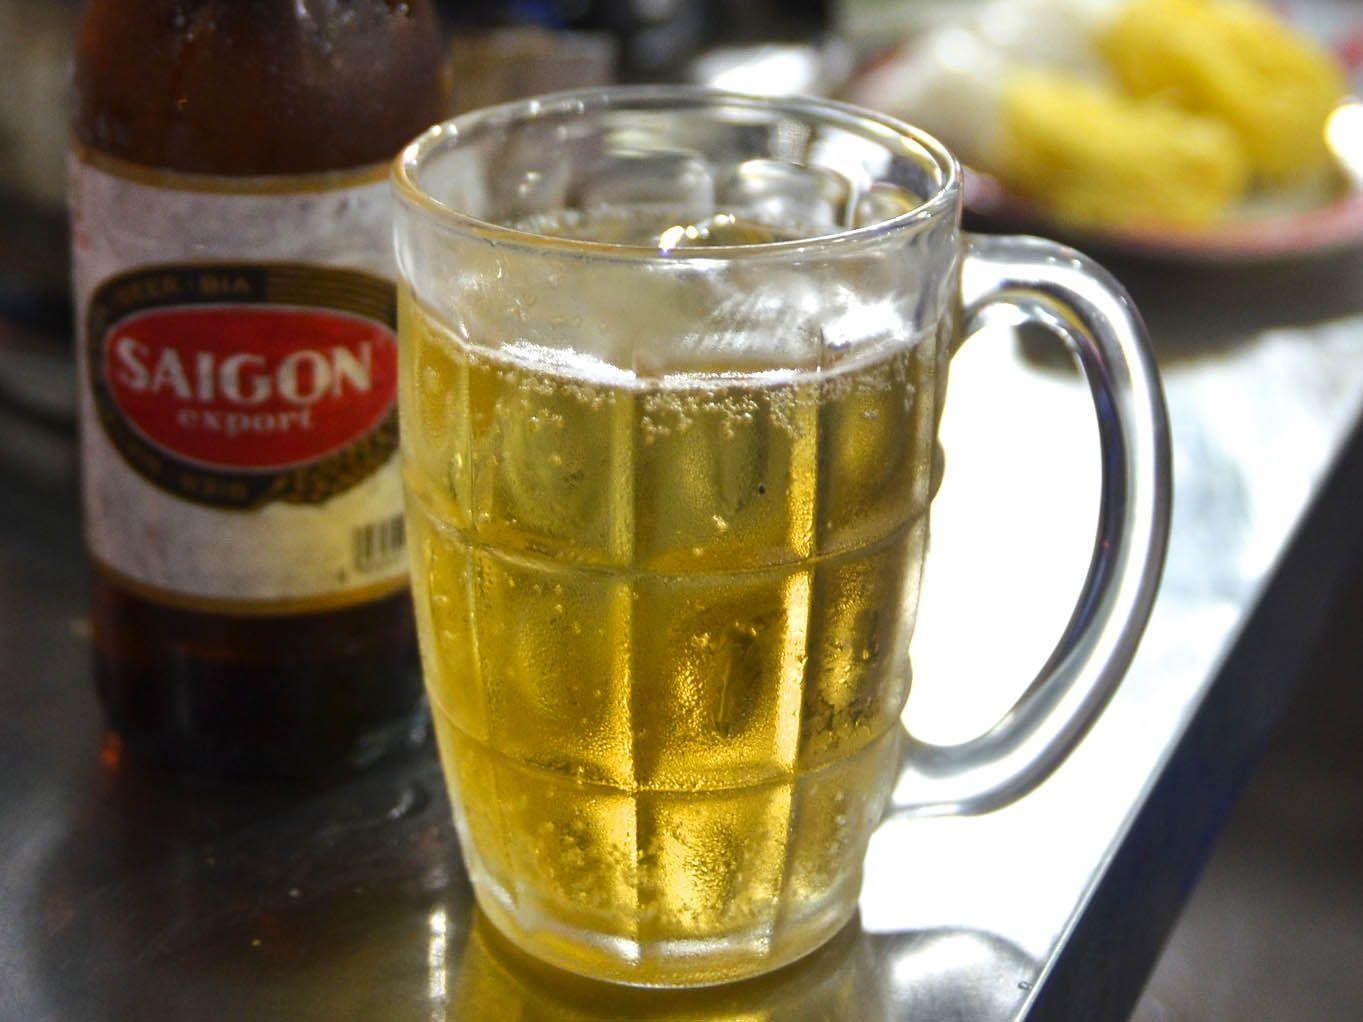 20140805-vietnam-drinks-beer-barbara-adam.jpg